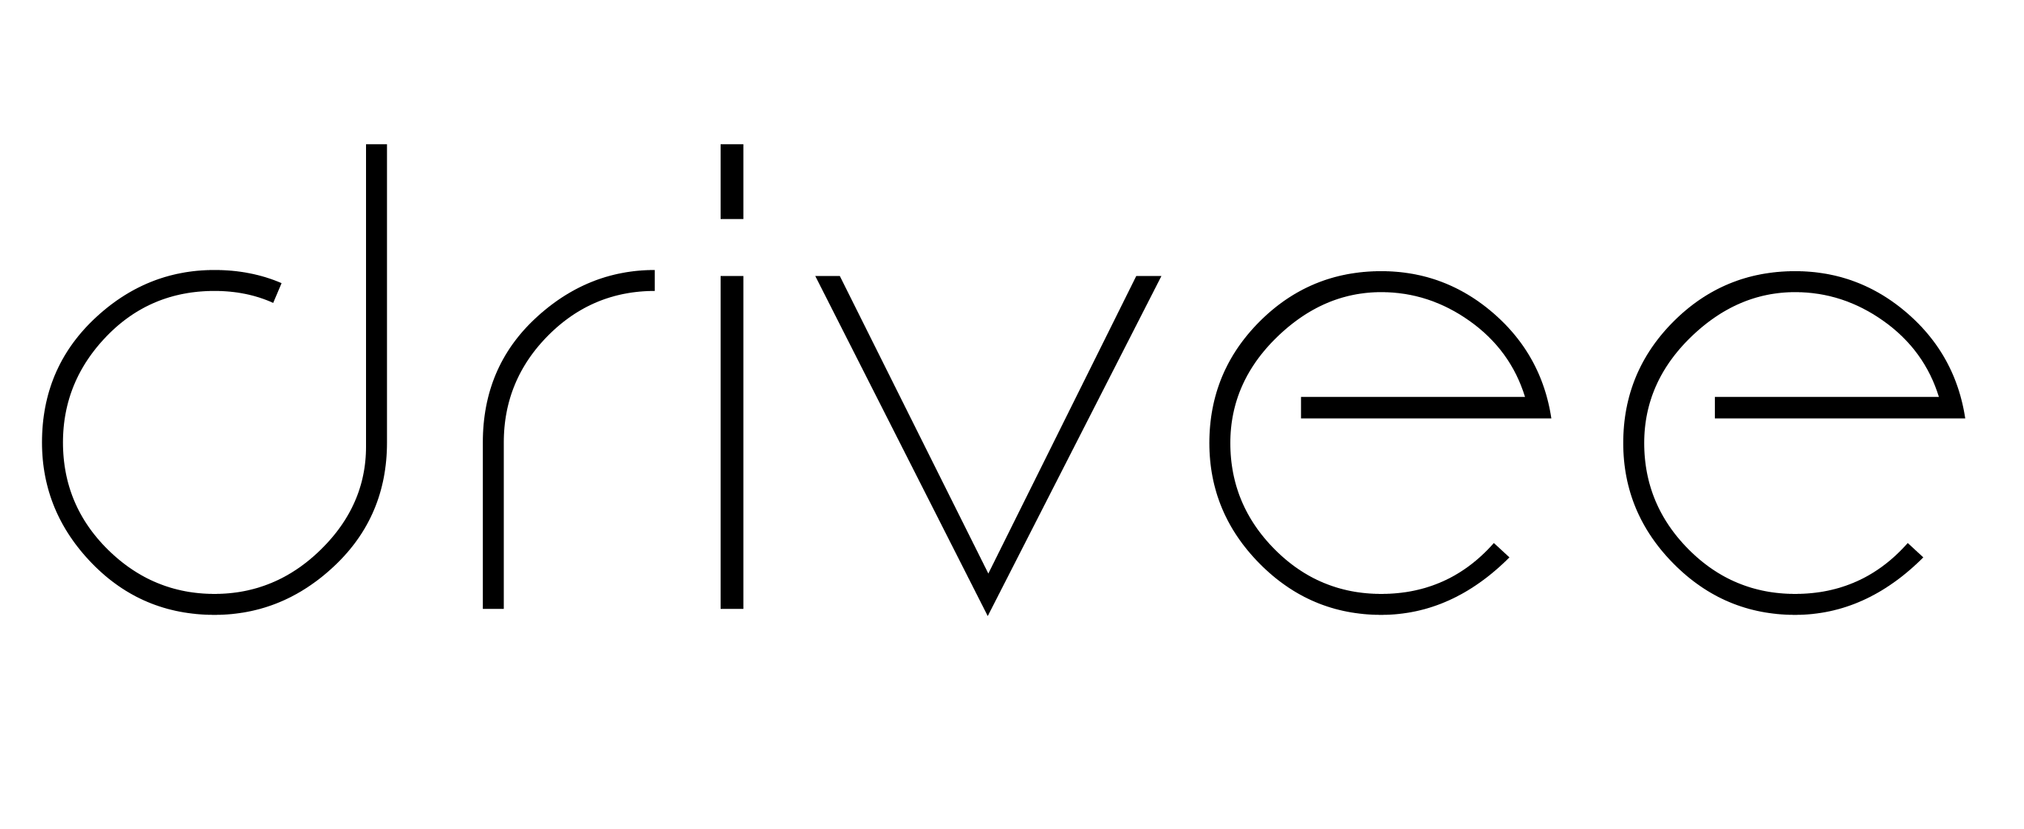 drivee